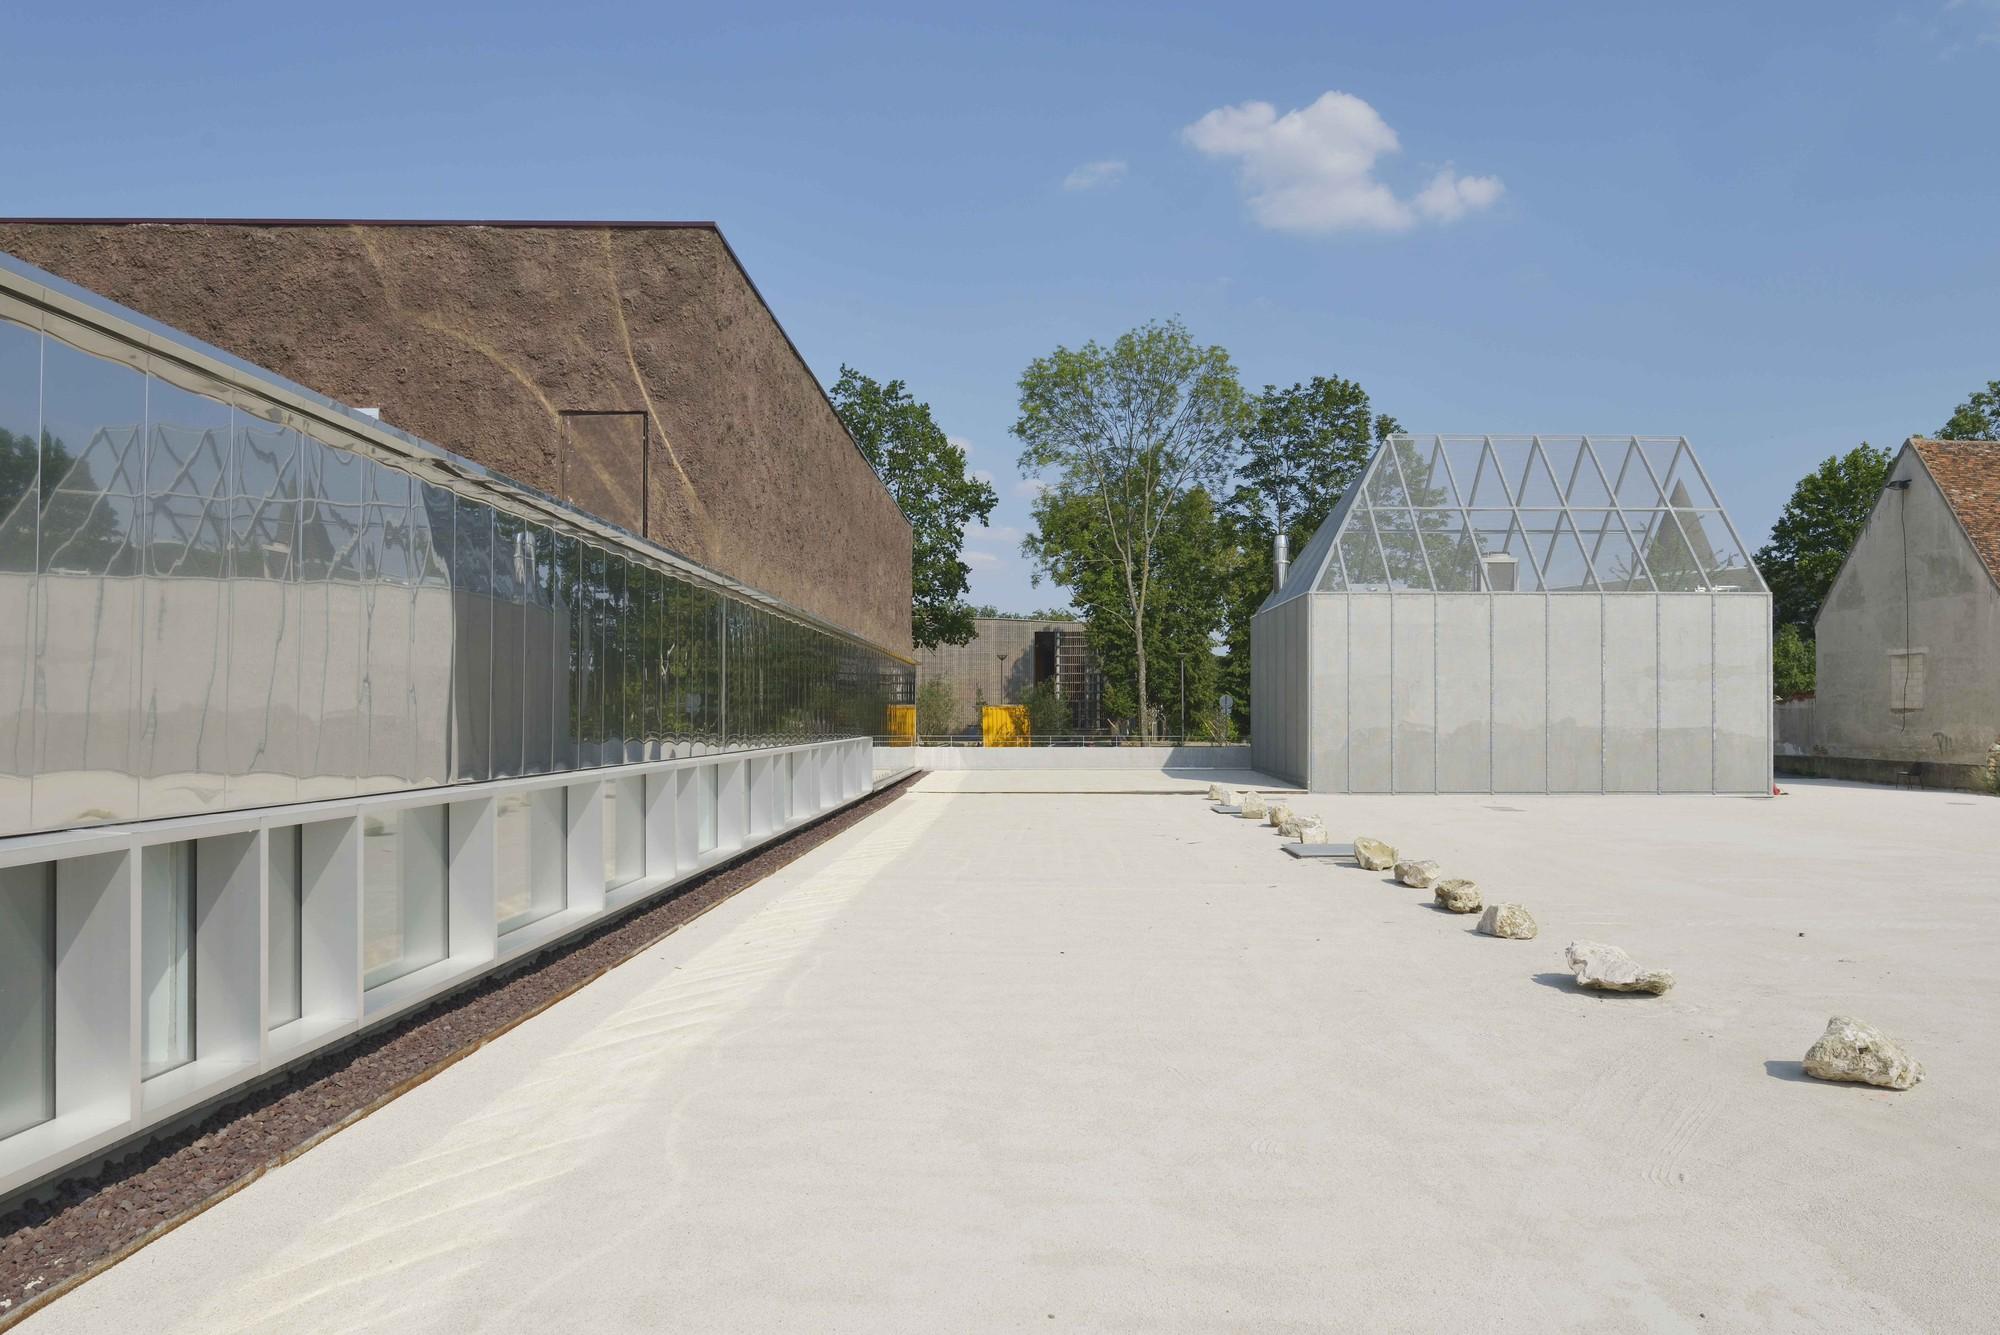 Marne-la-Vallée Library / Beckmann-N'Thépé Architects